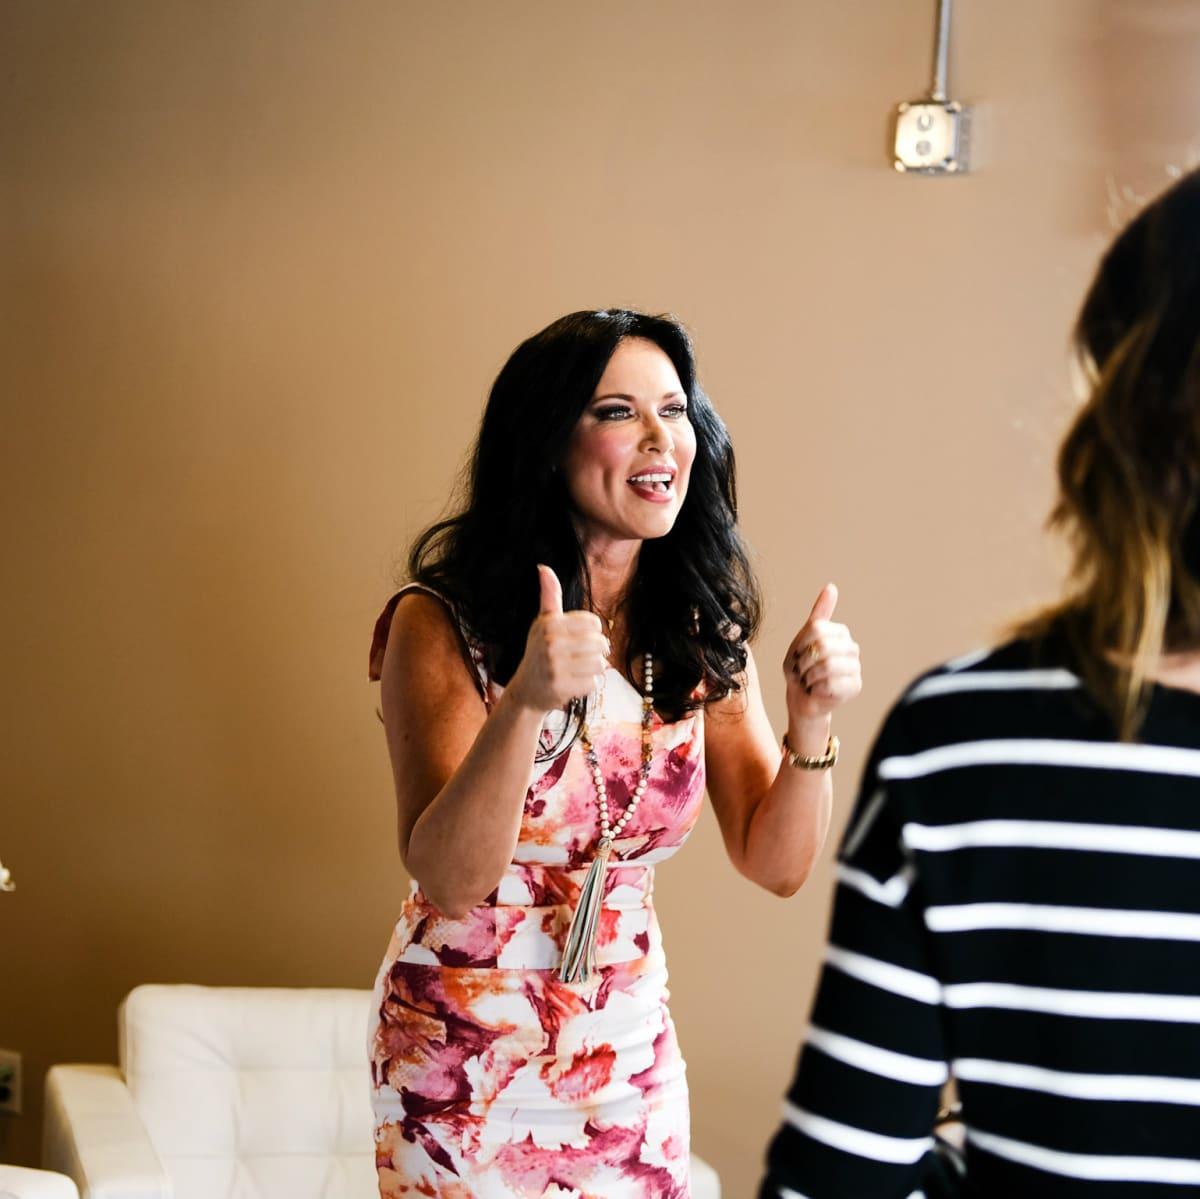 Real Housewives of Dallas LeeAnne Locken